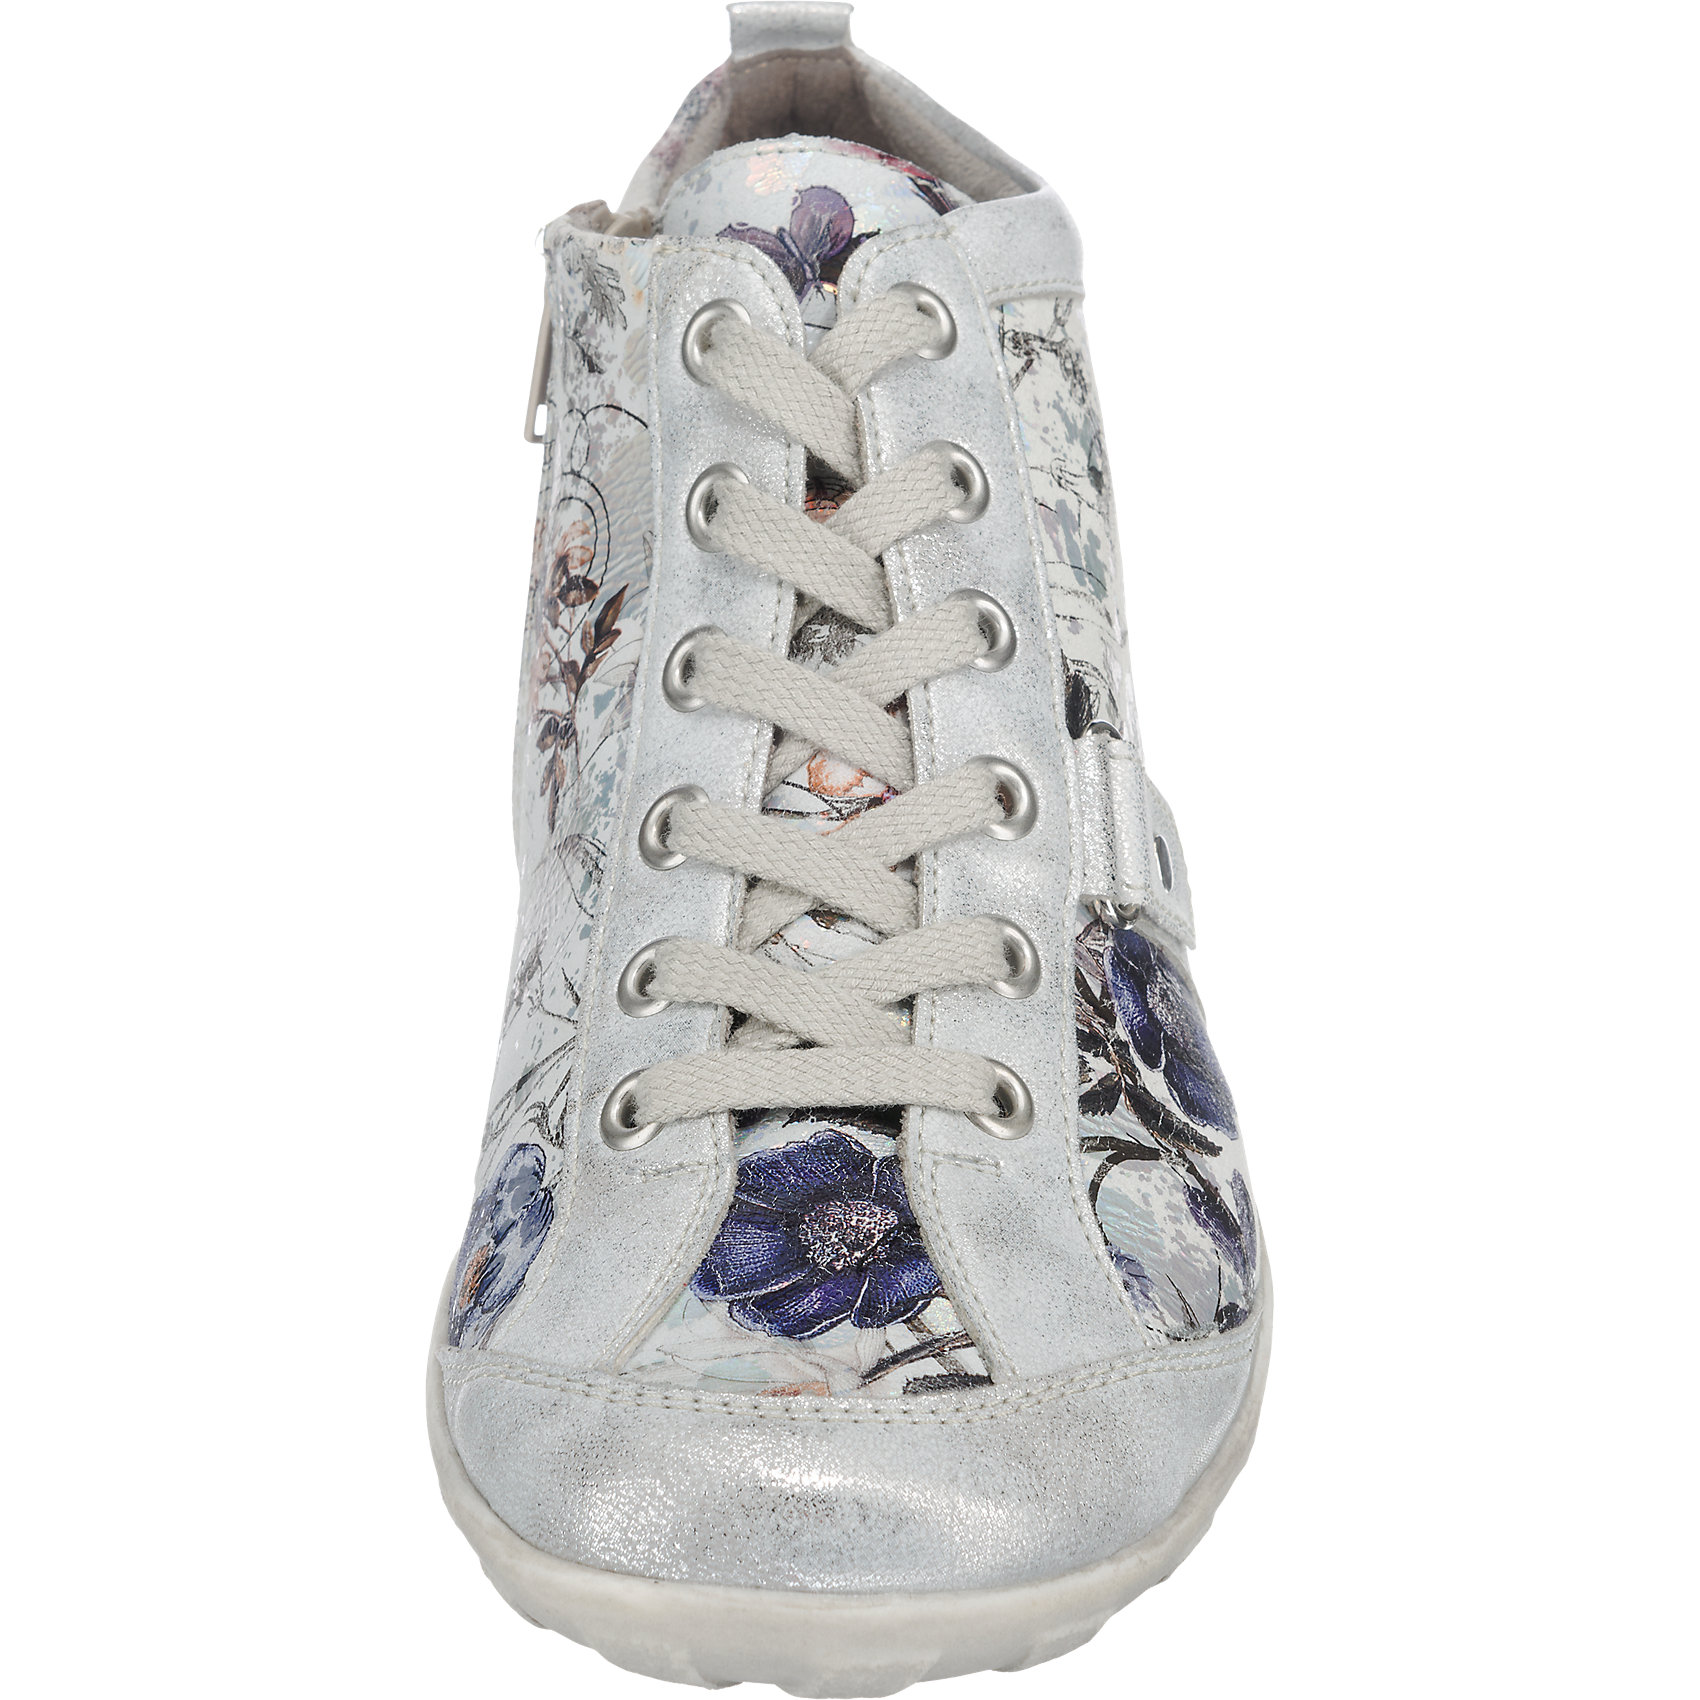 Neu silber remonte Sneakers silber Neu 5765614 344ff5